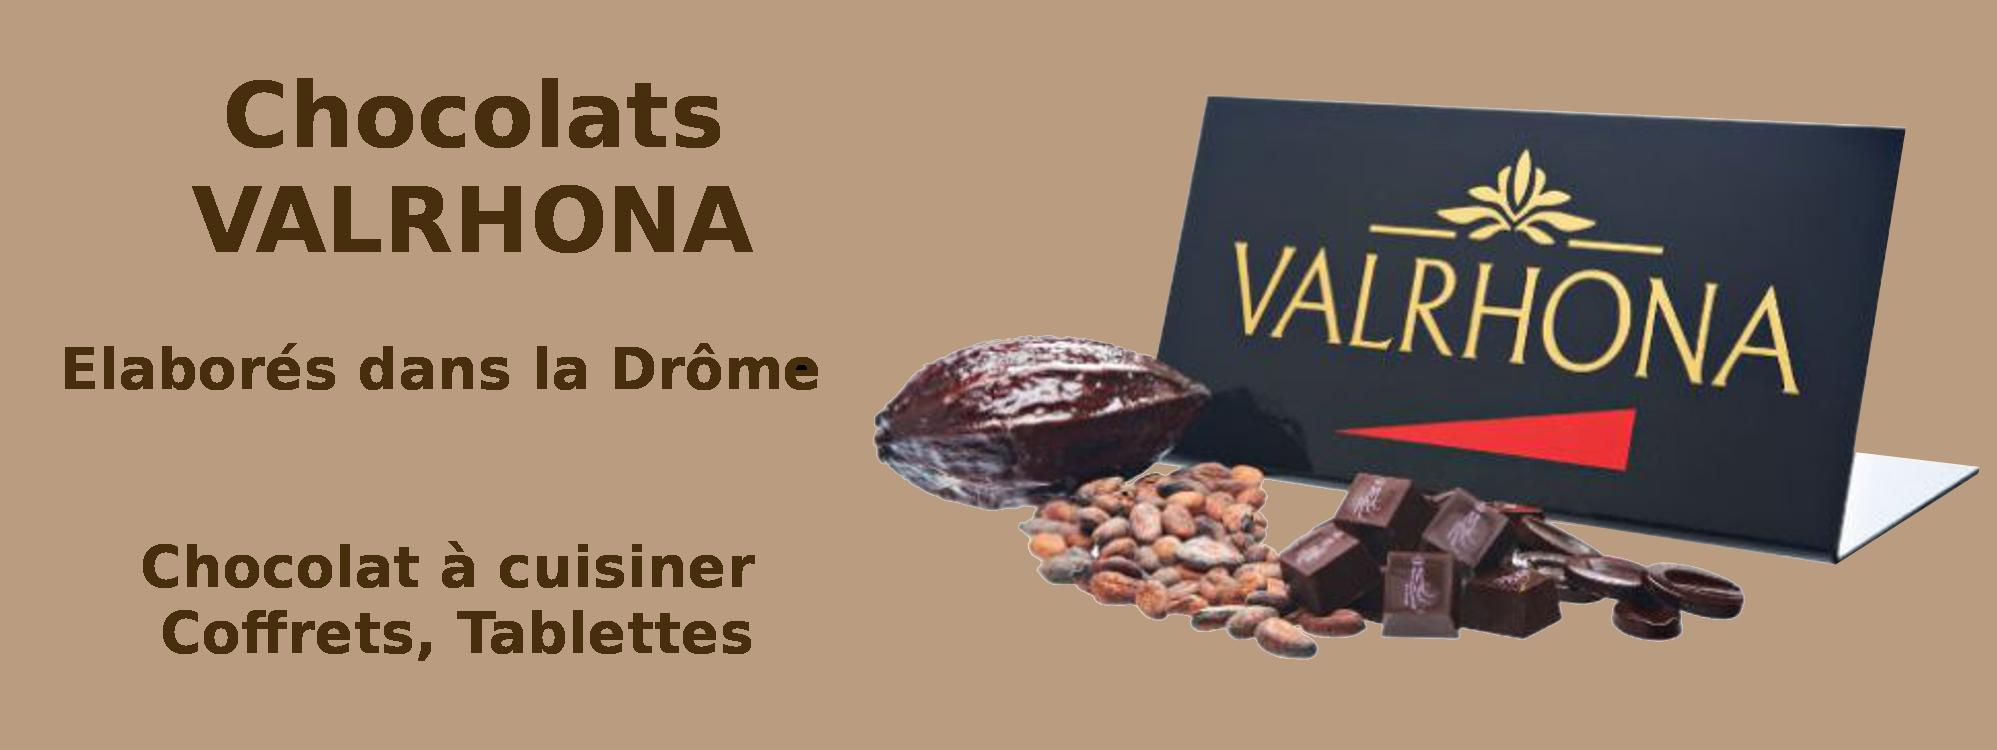 Valrhona, le chocolat gastronomique